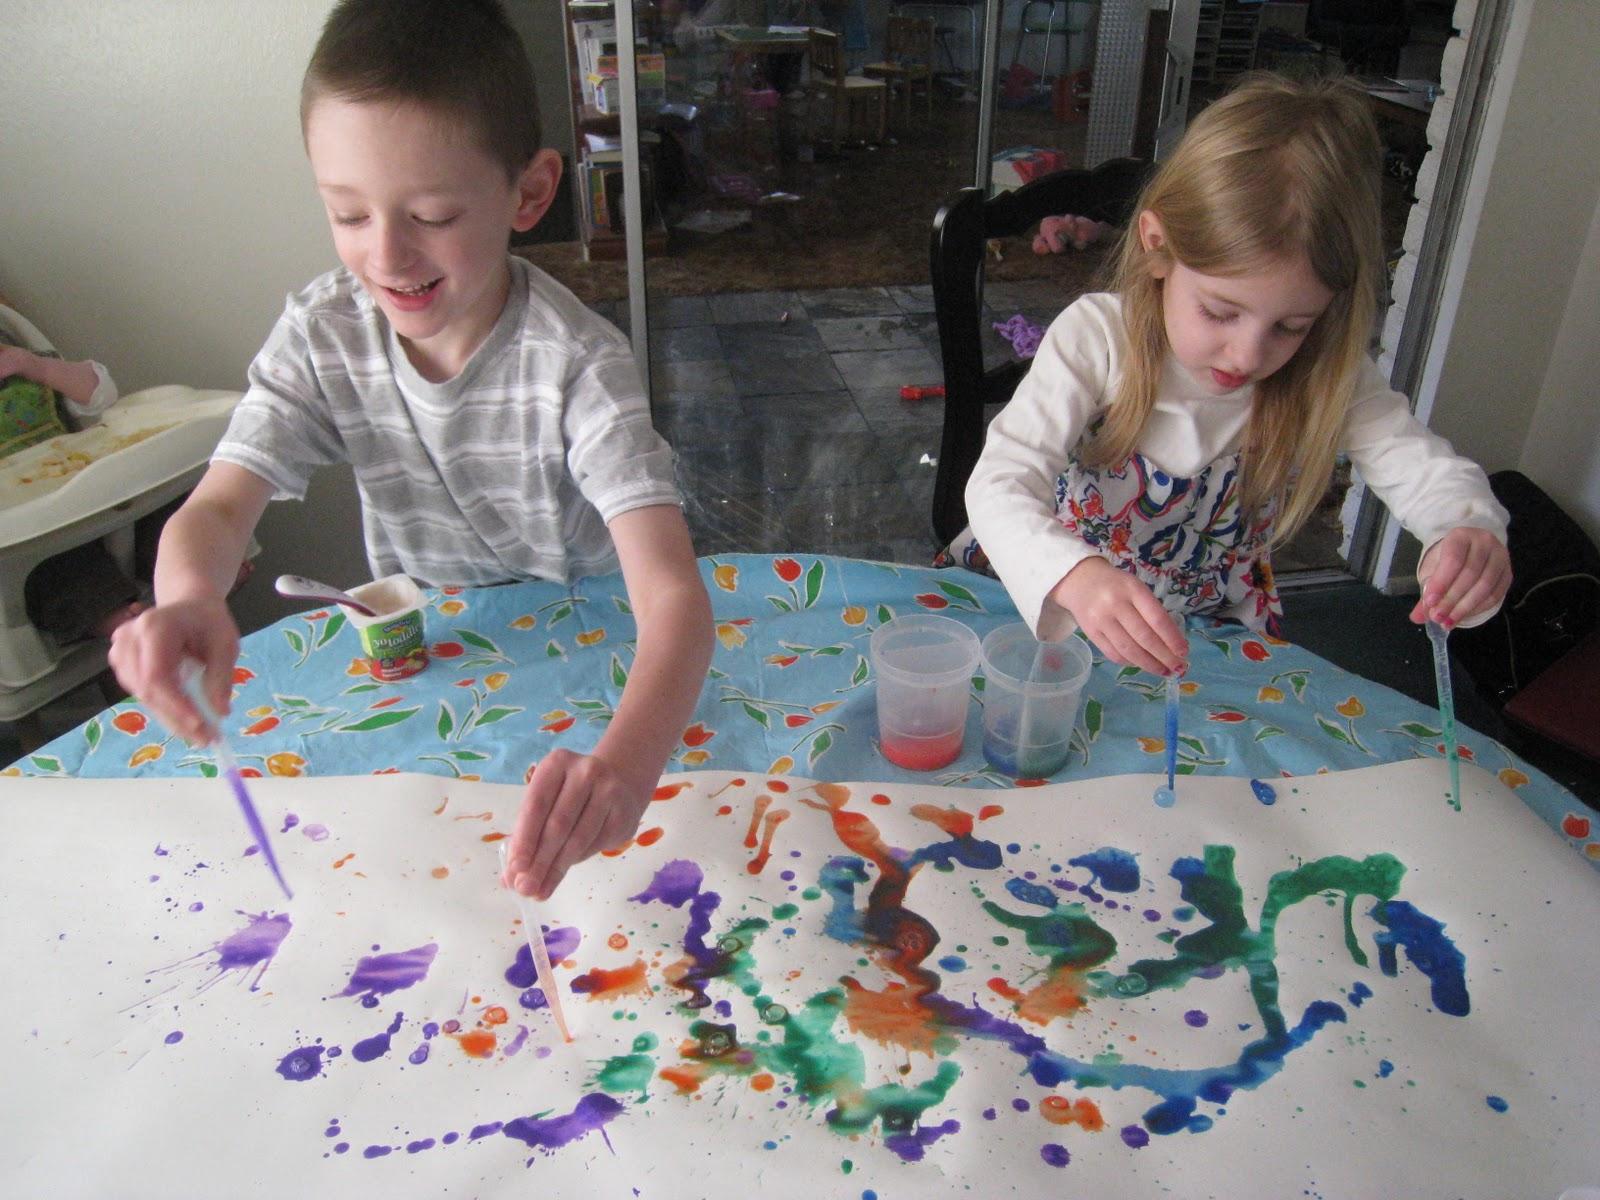 Artist Study- Jackson Pollock - Teach Beside Me